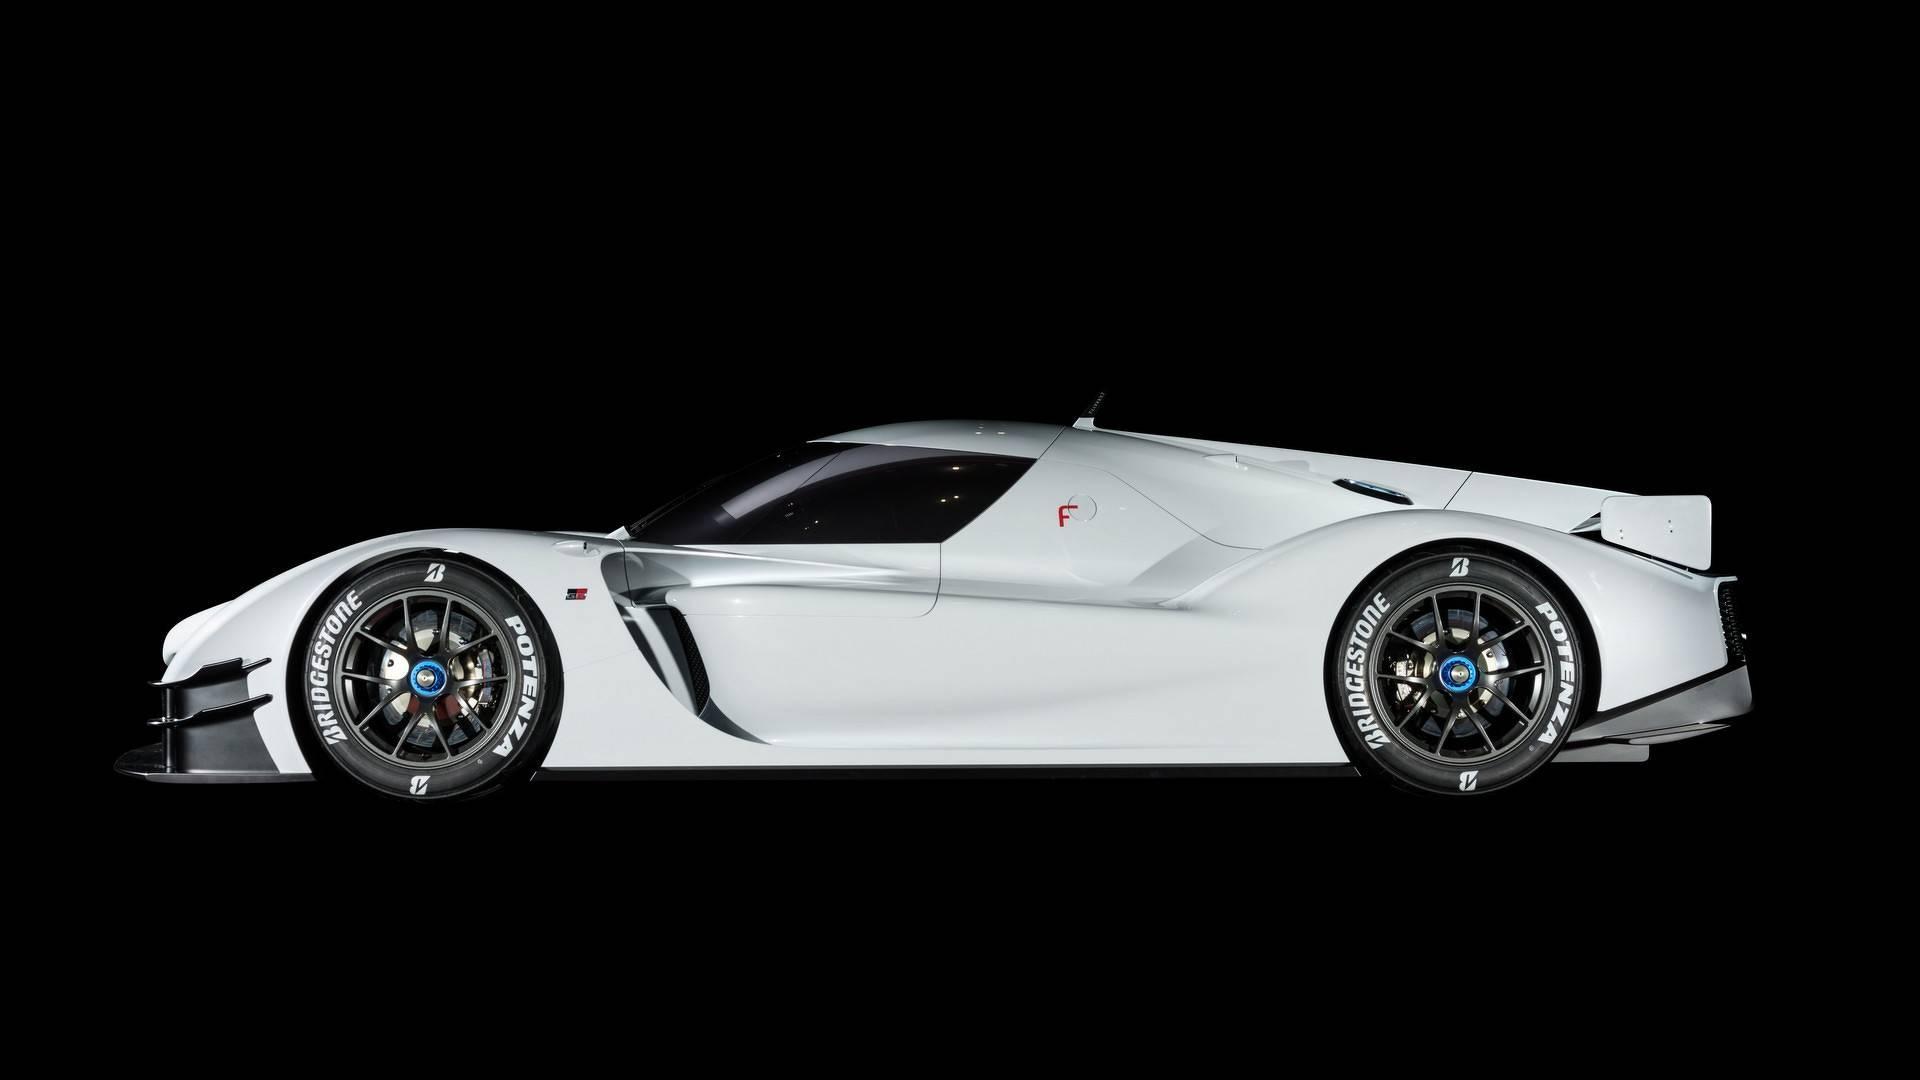 Toyota-GR-Super-Sport-Concept-2018-4.jpg